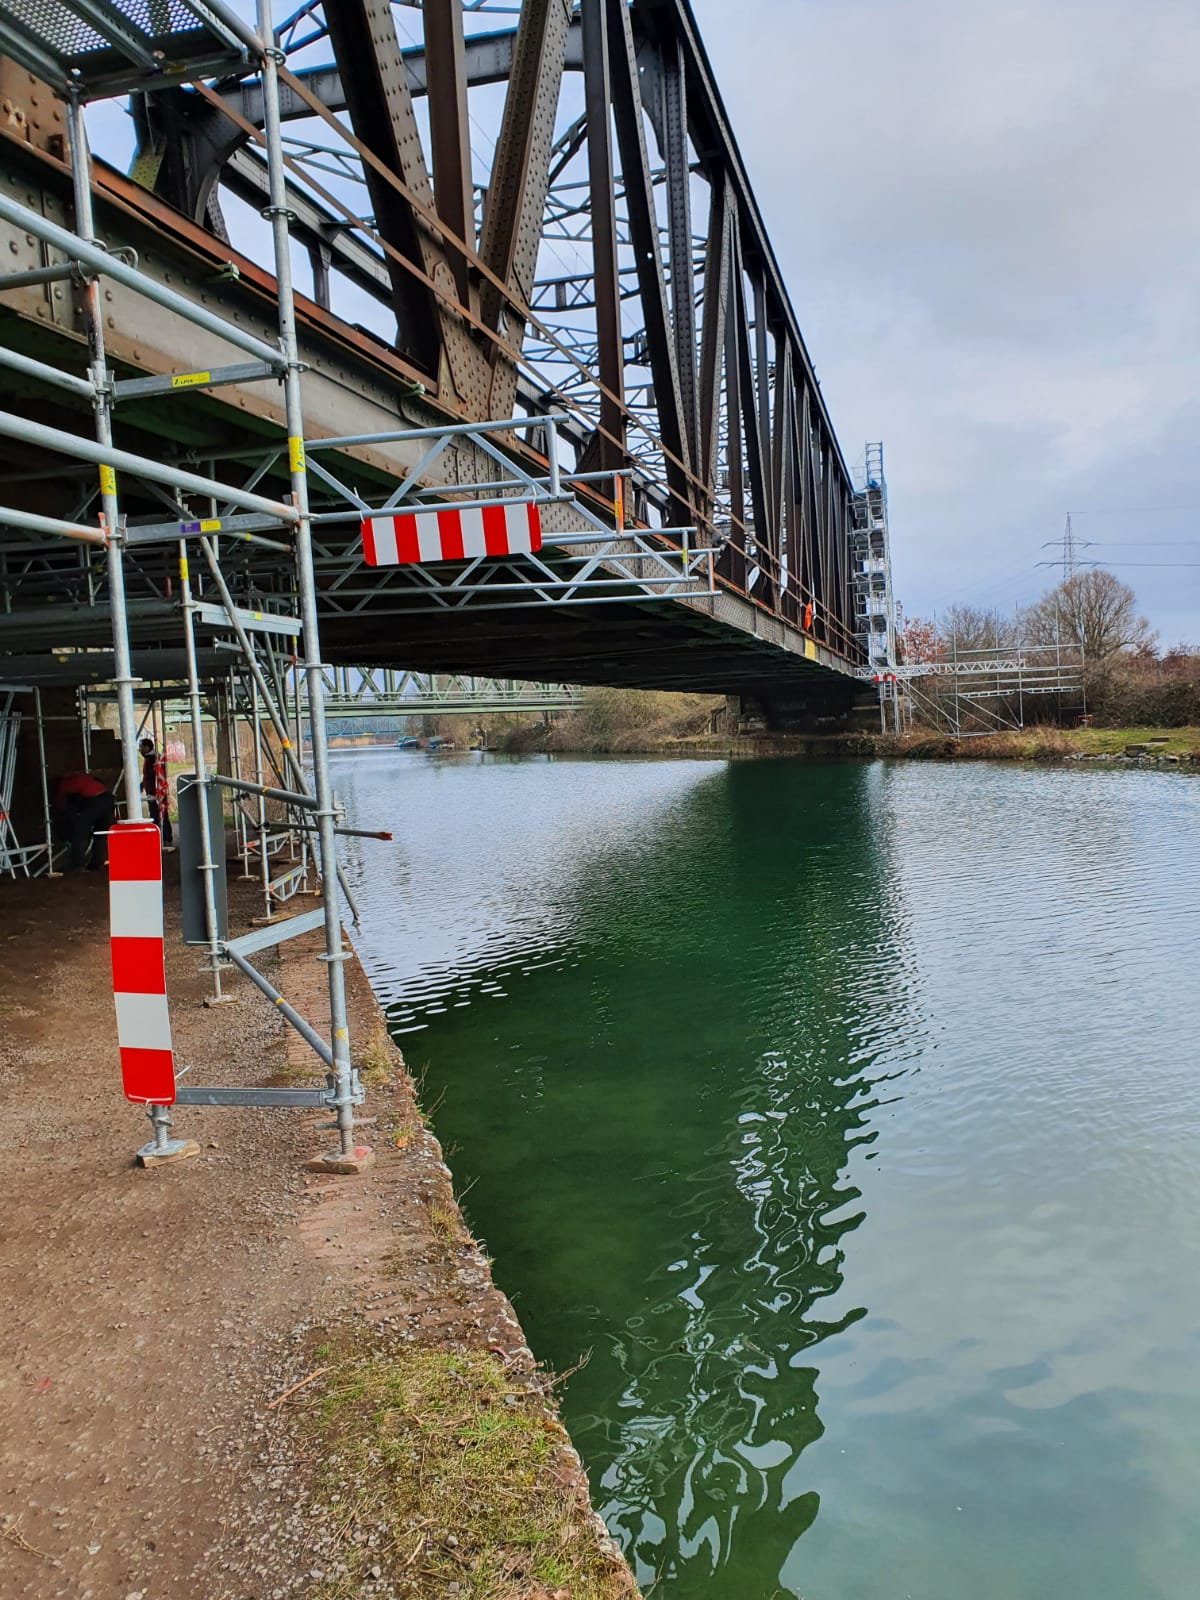 Kimi-Geruestbau-Trockenbau-Fassadengeruest-Wedel-Uetersen-Hamburg-Stahlbau-Schröder-Bild-6